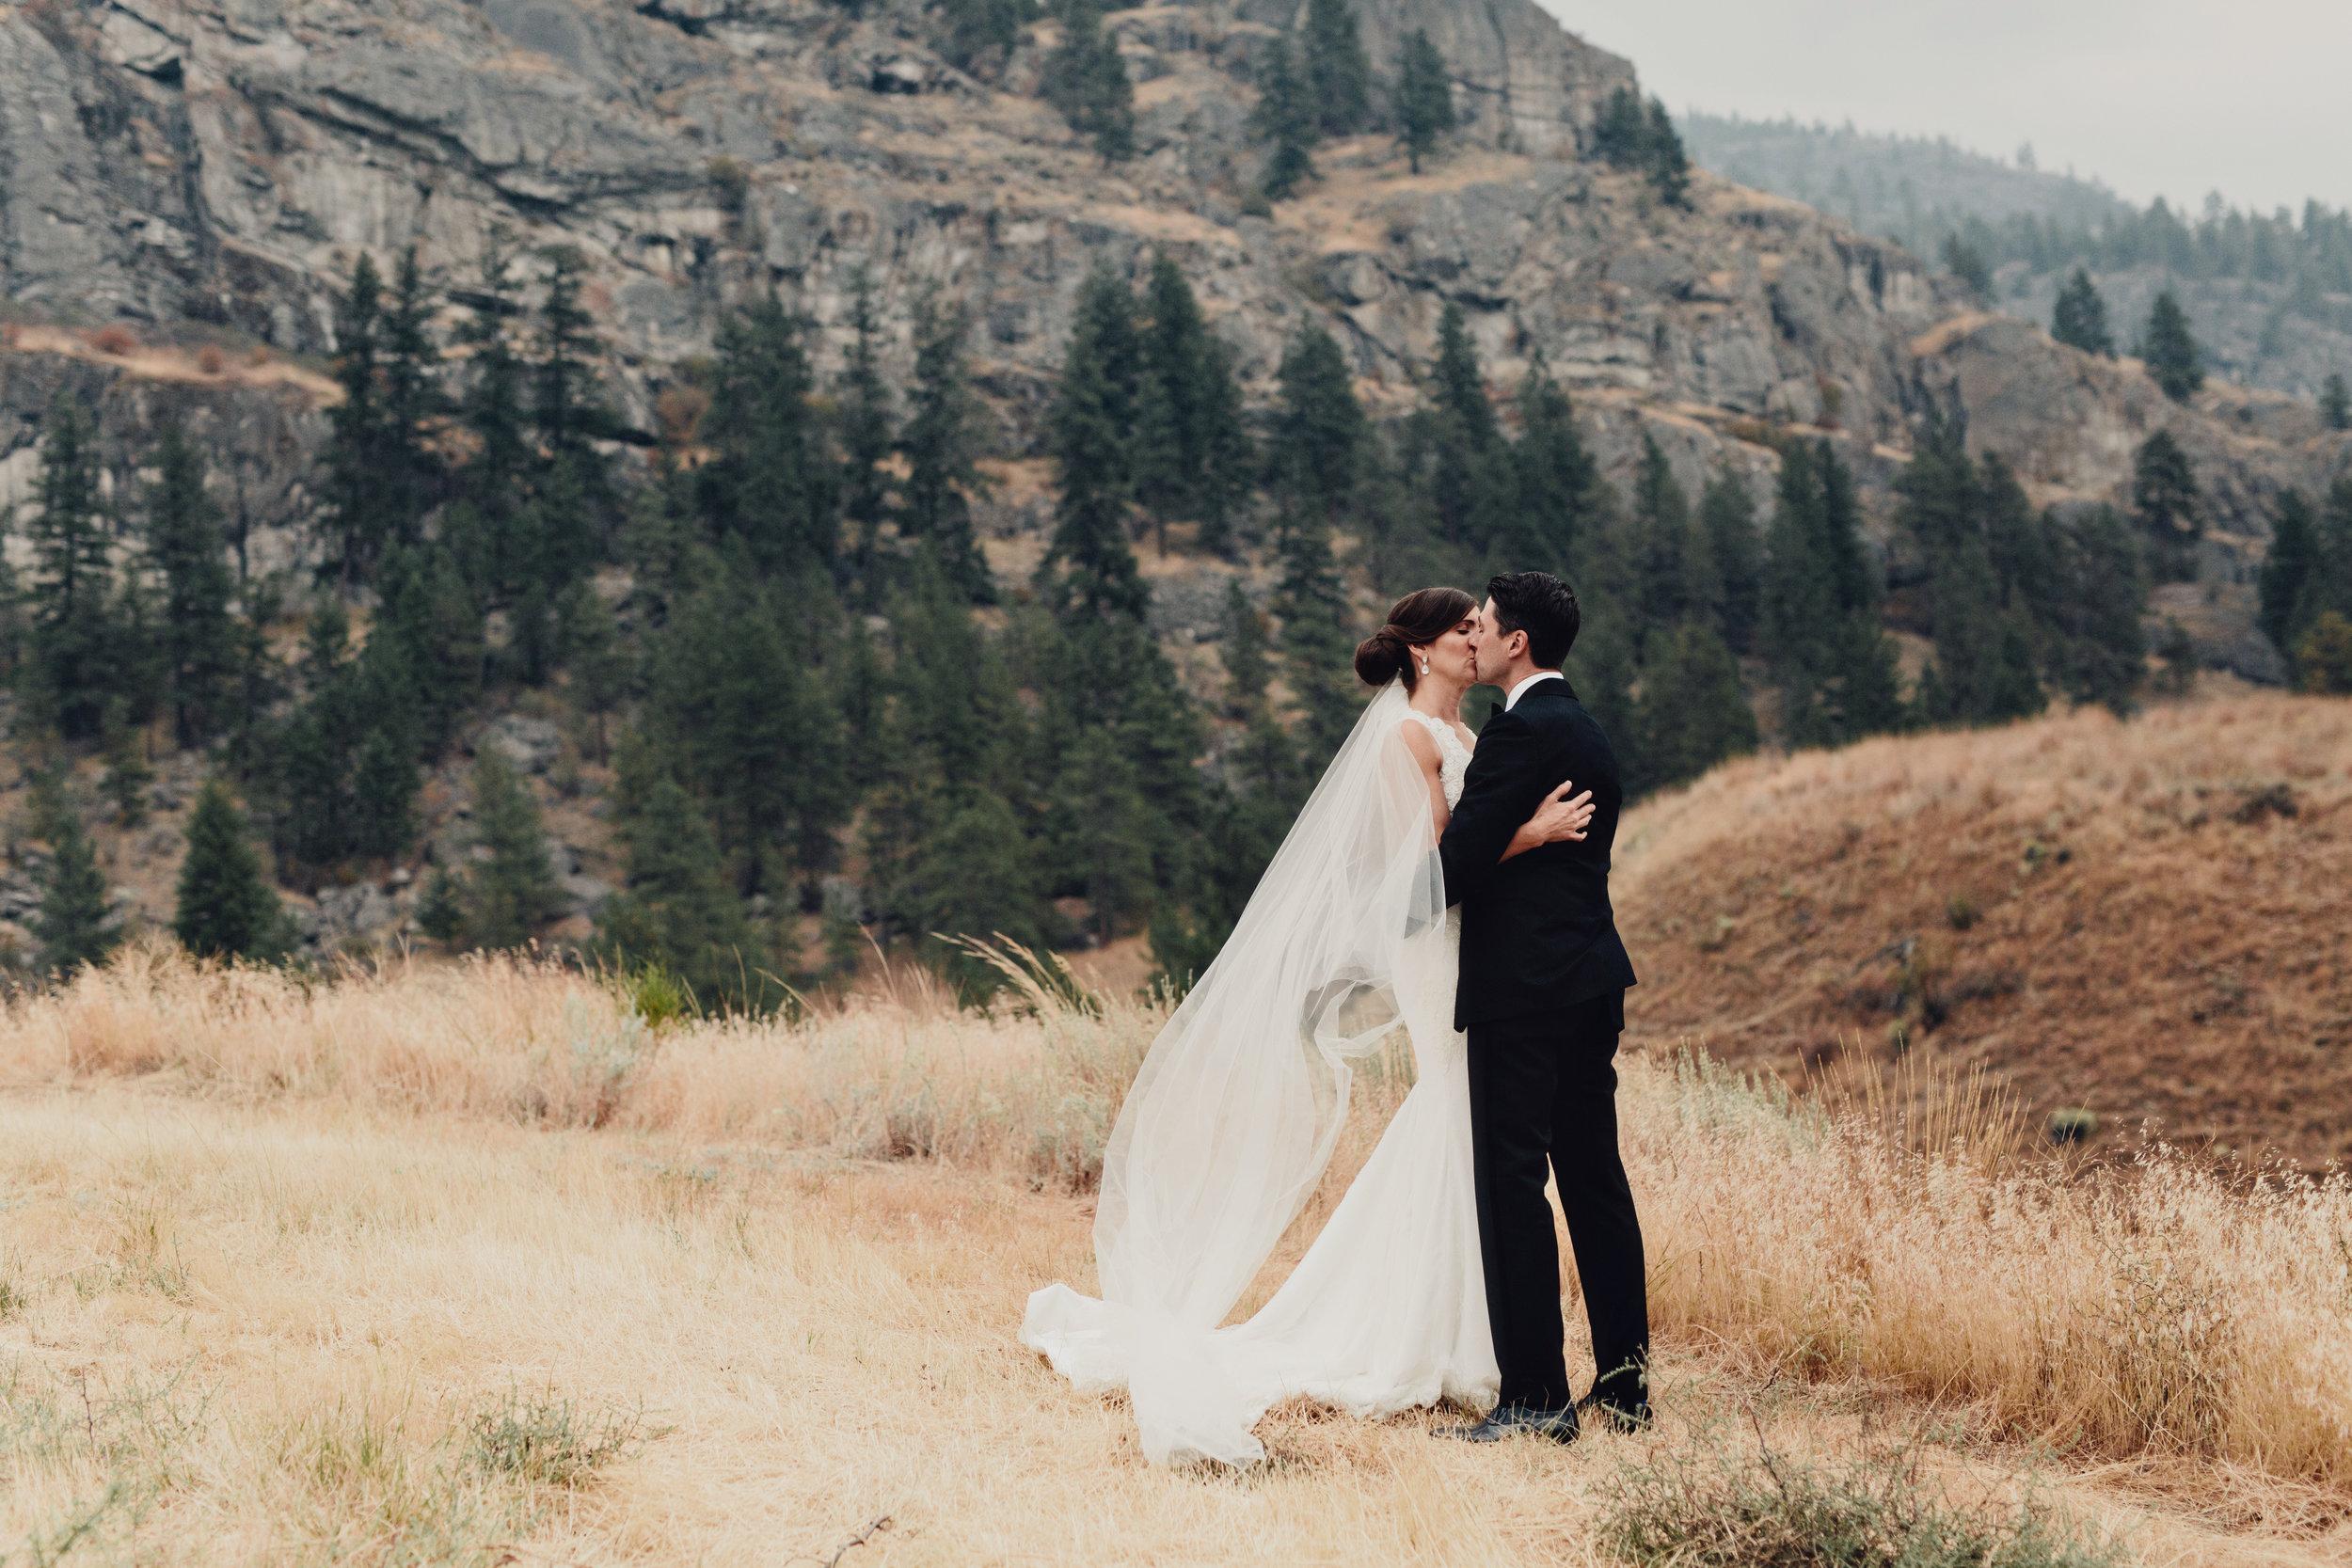 taylor-roades-wedding-0063.JPG